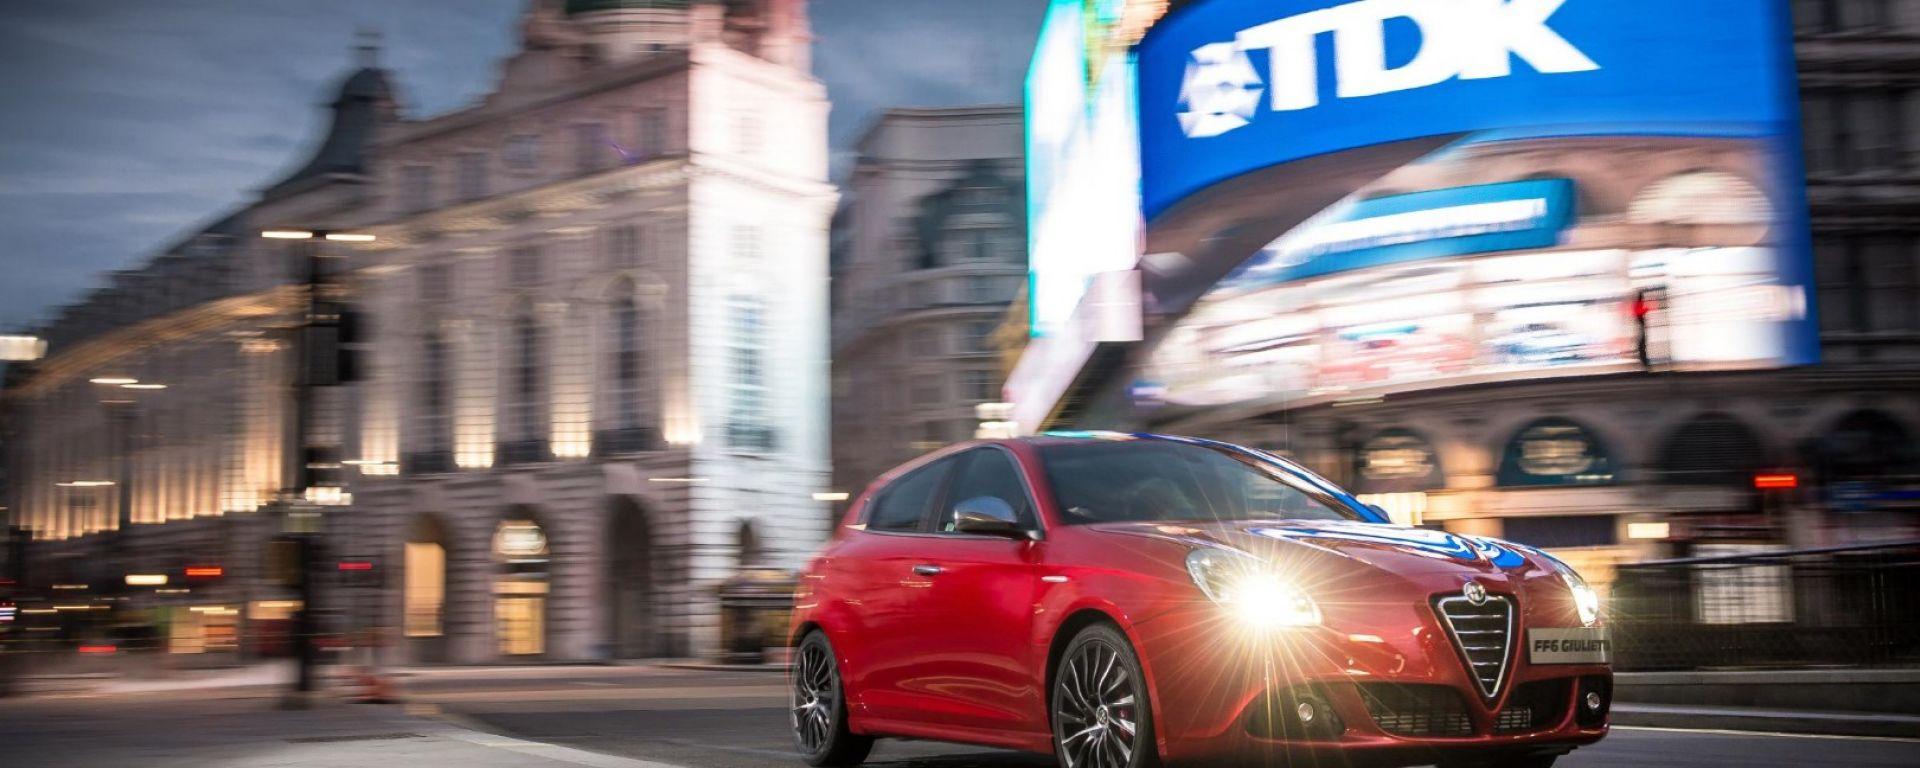 Alfa Romeo Giulietta Fast & Furious 6